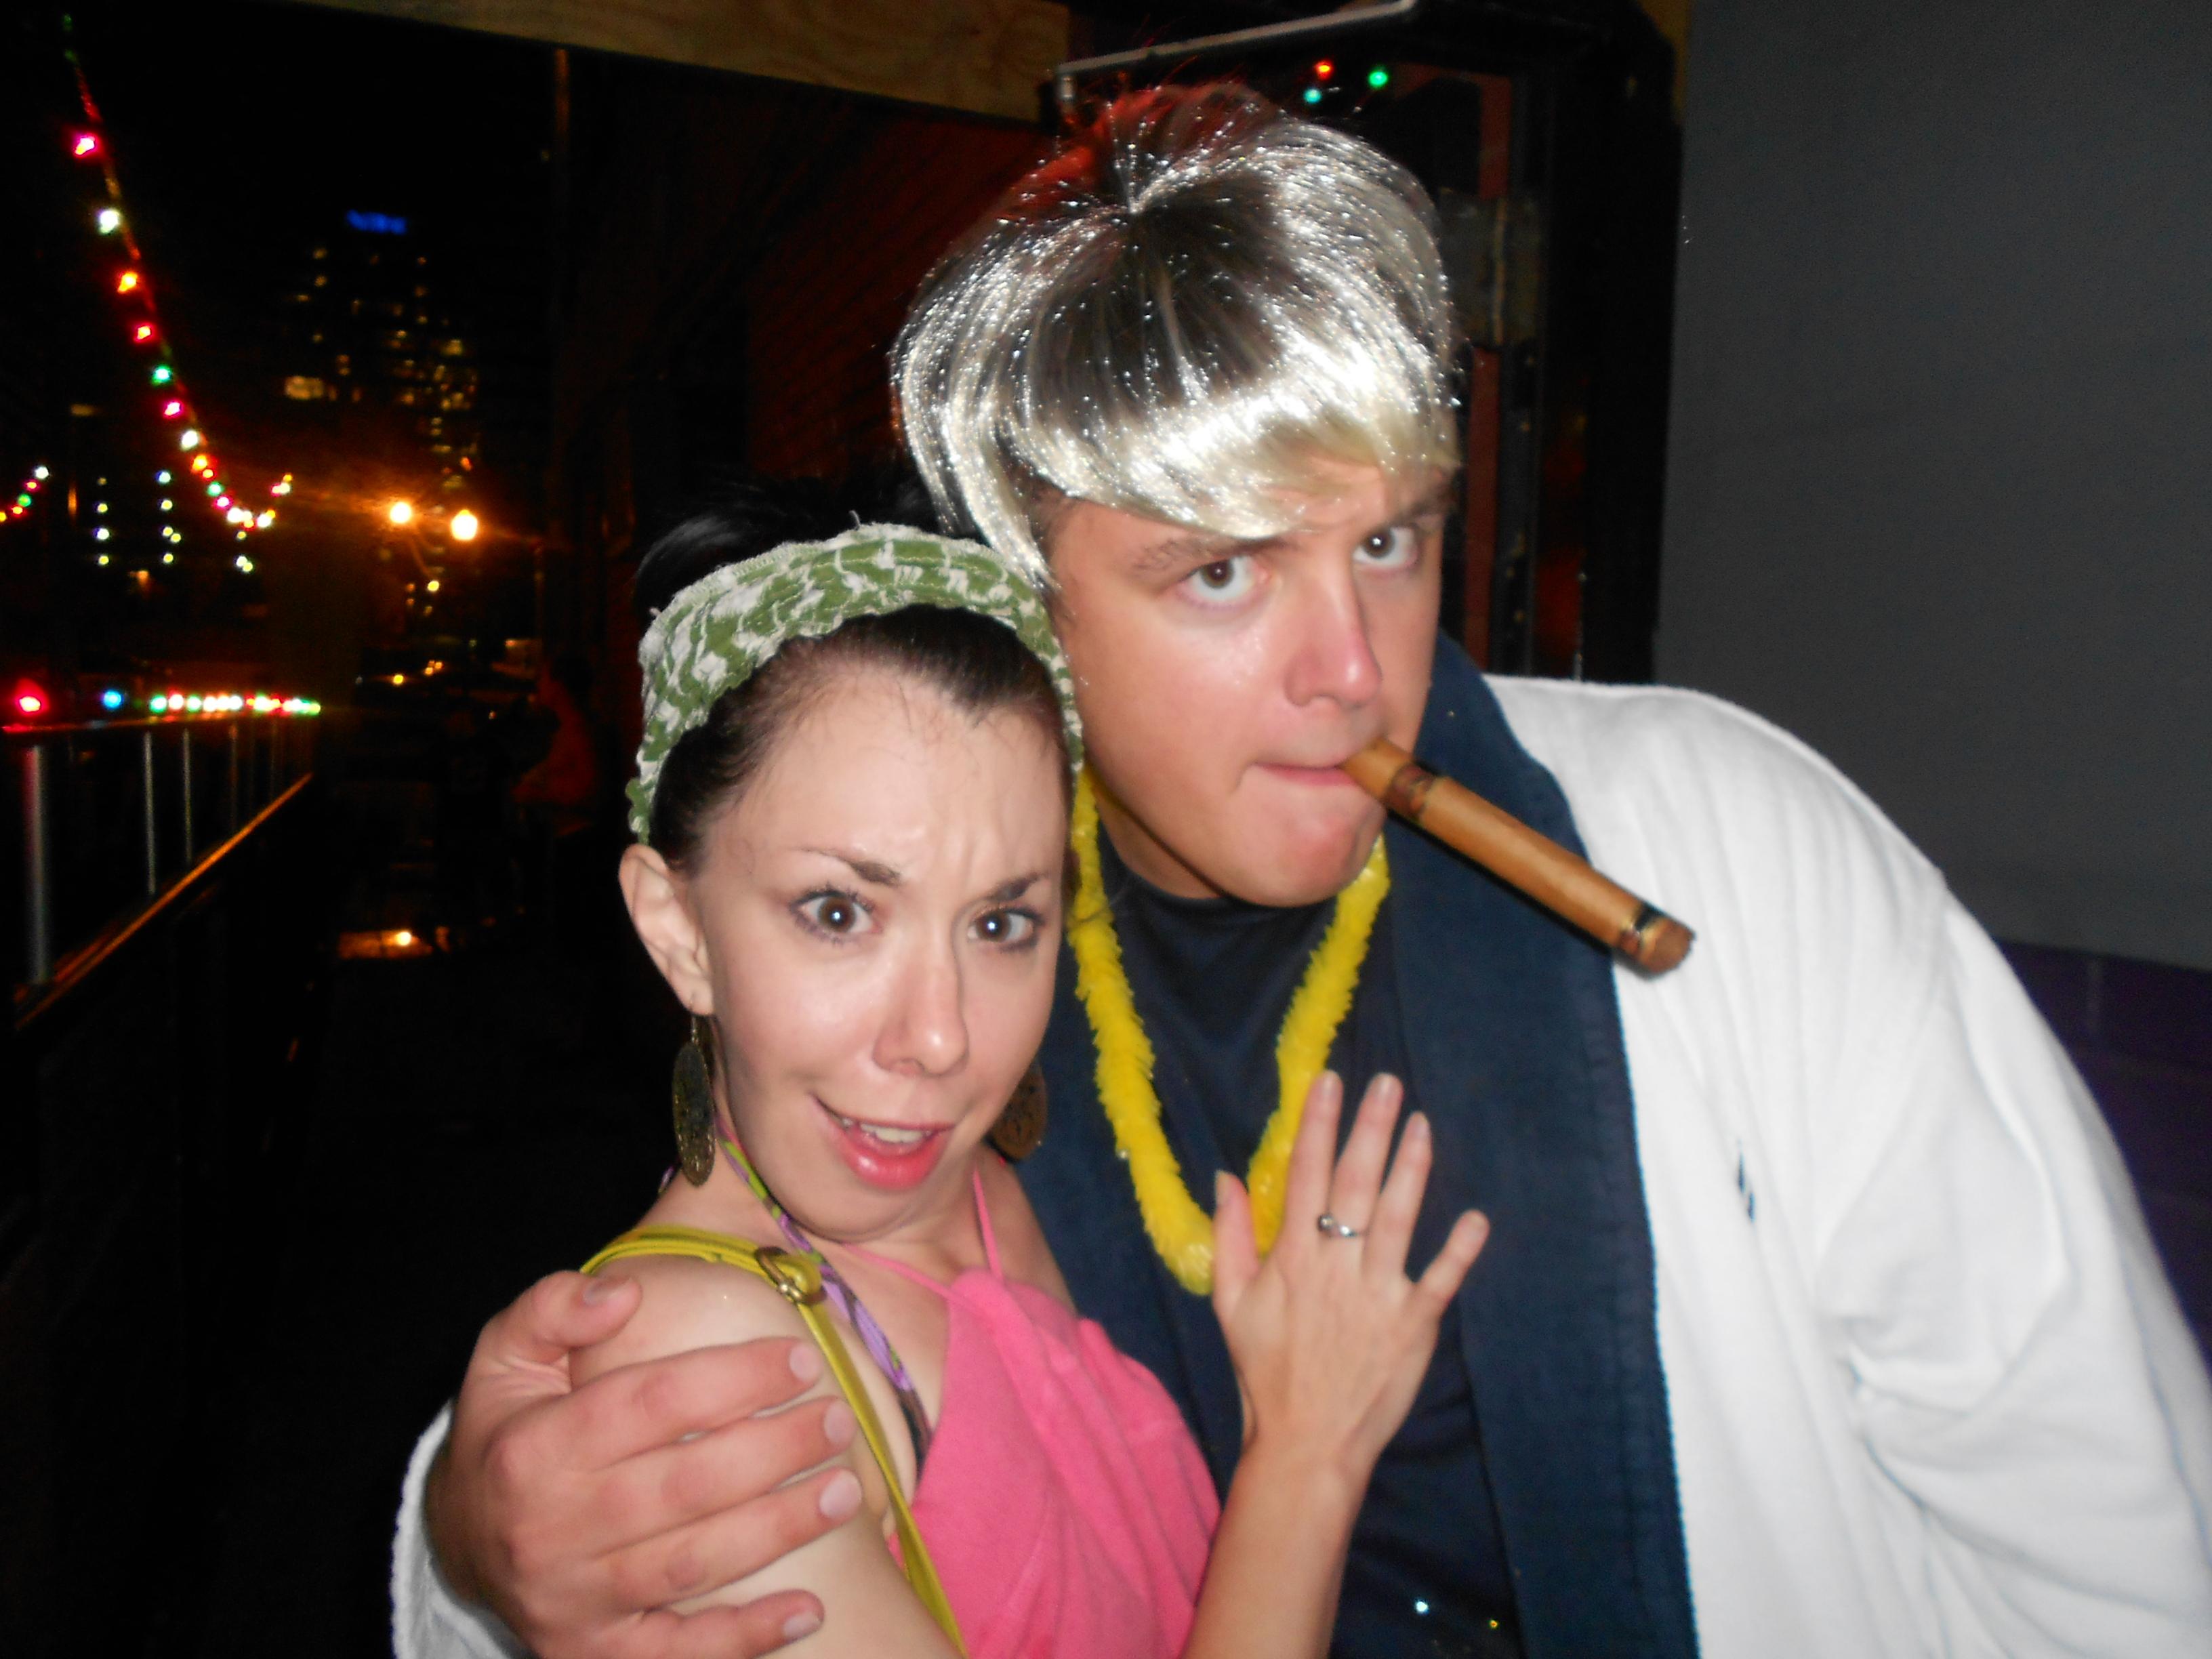 Day 328:  Crankypants Dress 9